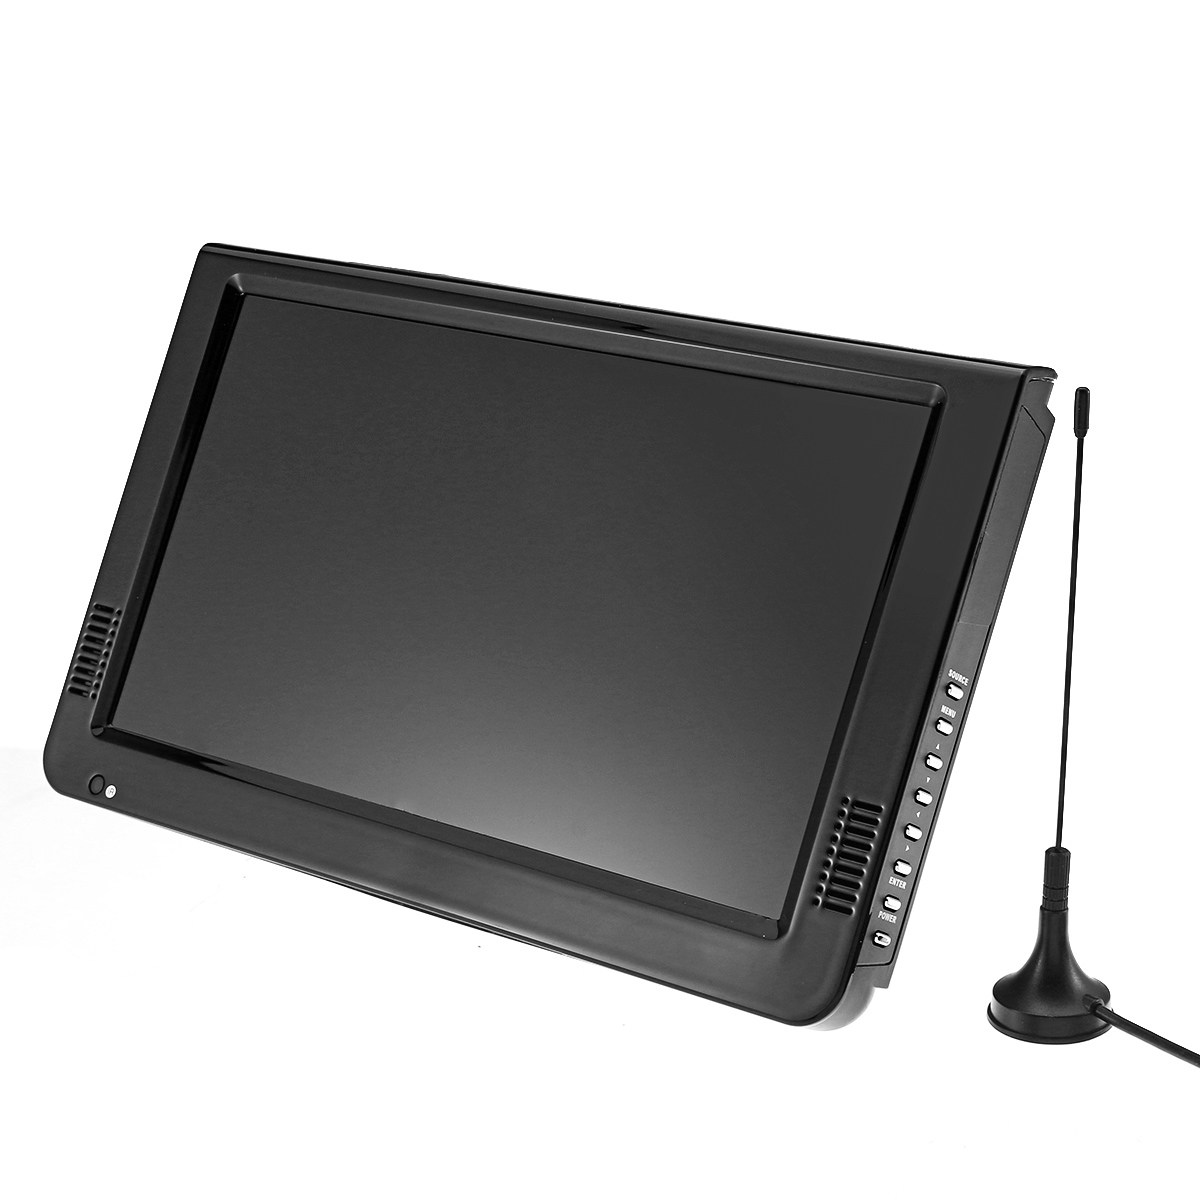 KROAK 10.2'' 12V Portable DVB-T/DVB-T2 TFT LED HD TV Television Digital Analog AC/DC 7 inch portable led tv television dvb t mpeg4 pvr black